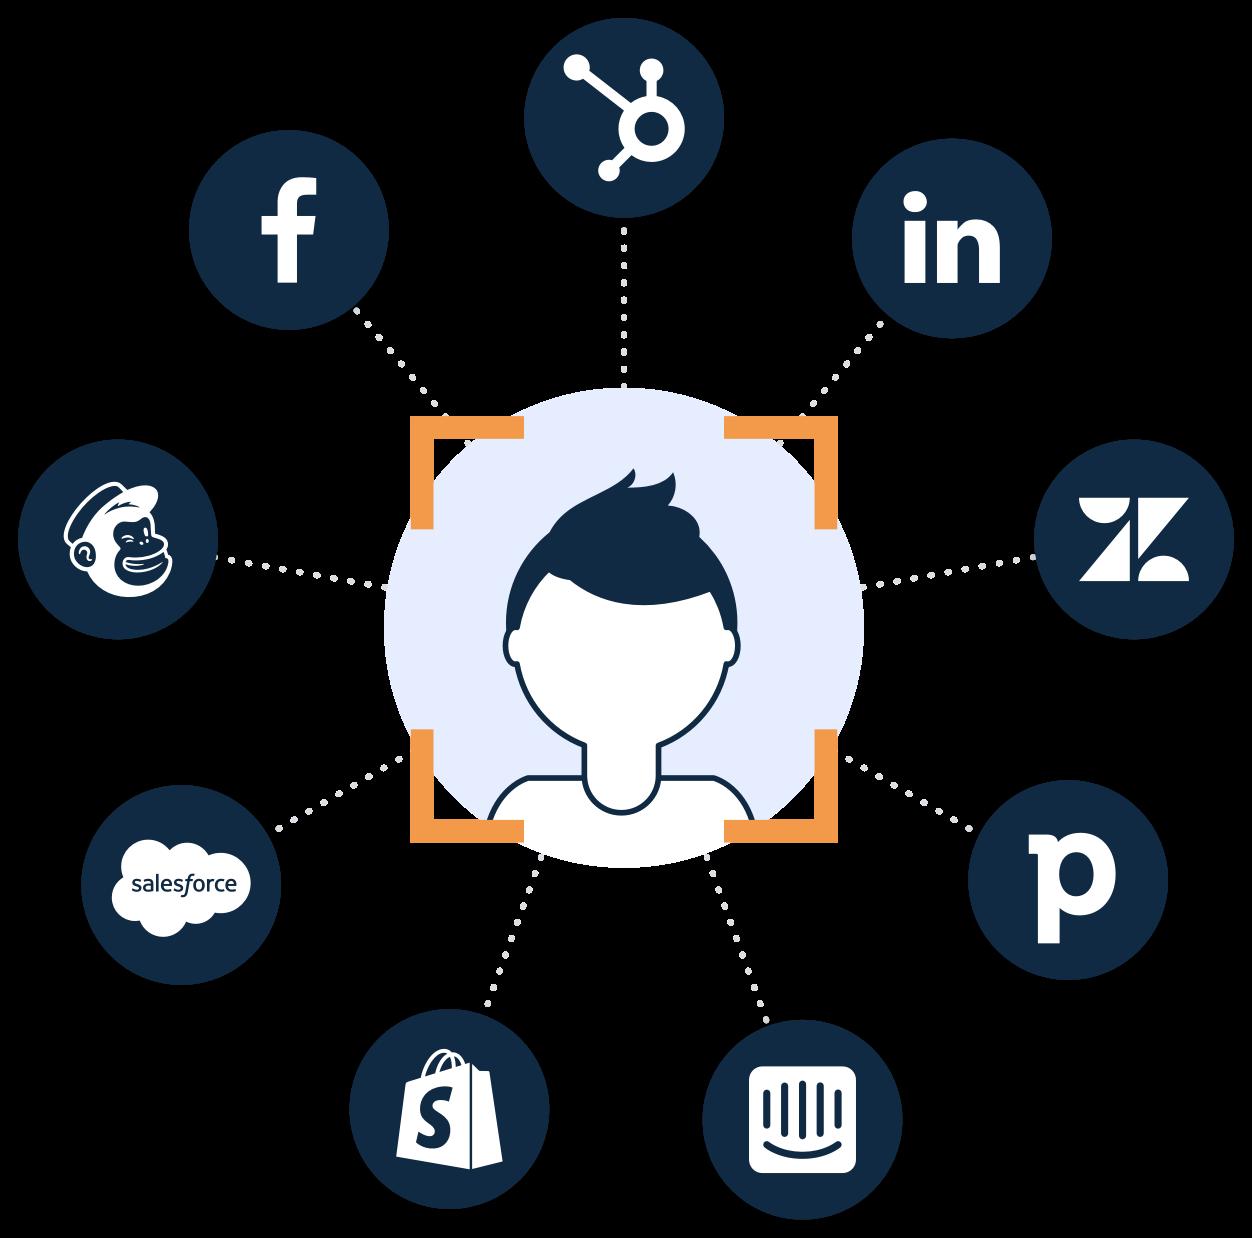 journy.io is foremost an intelligent customer data platform